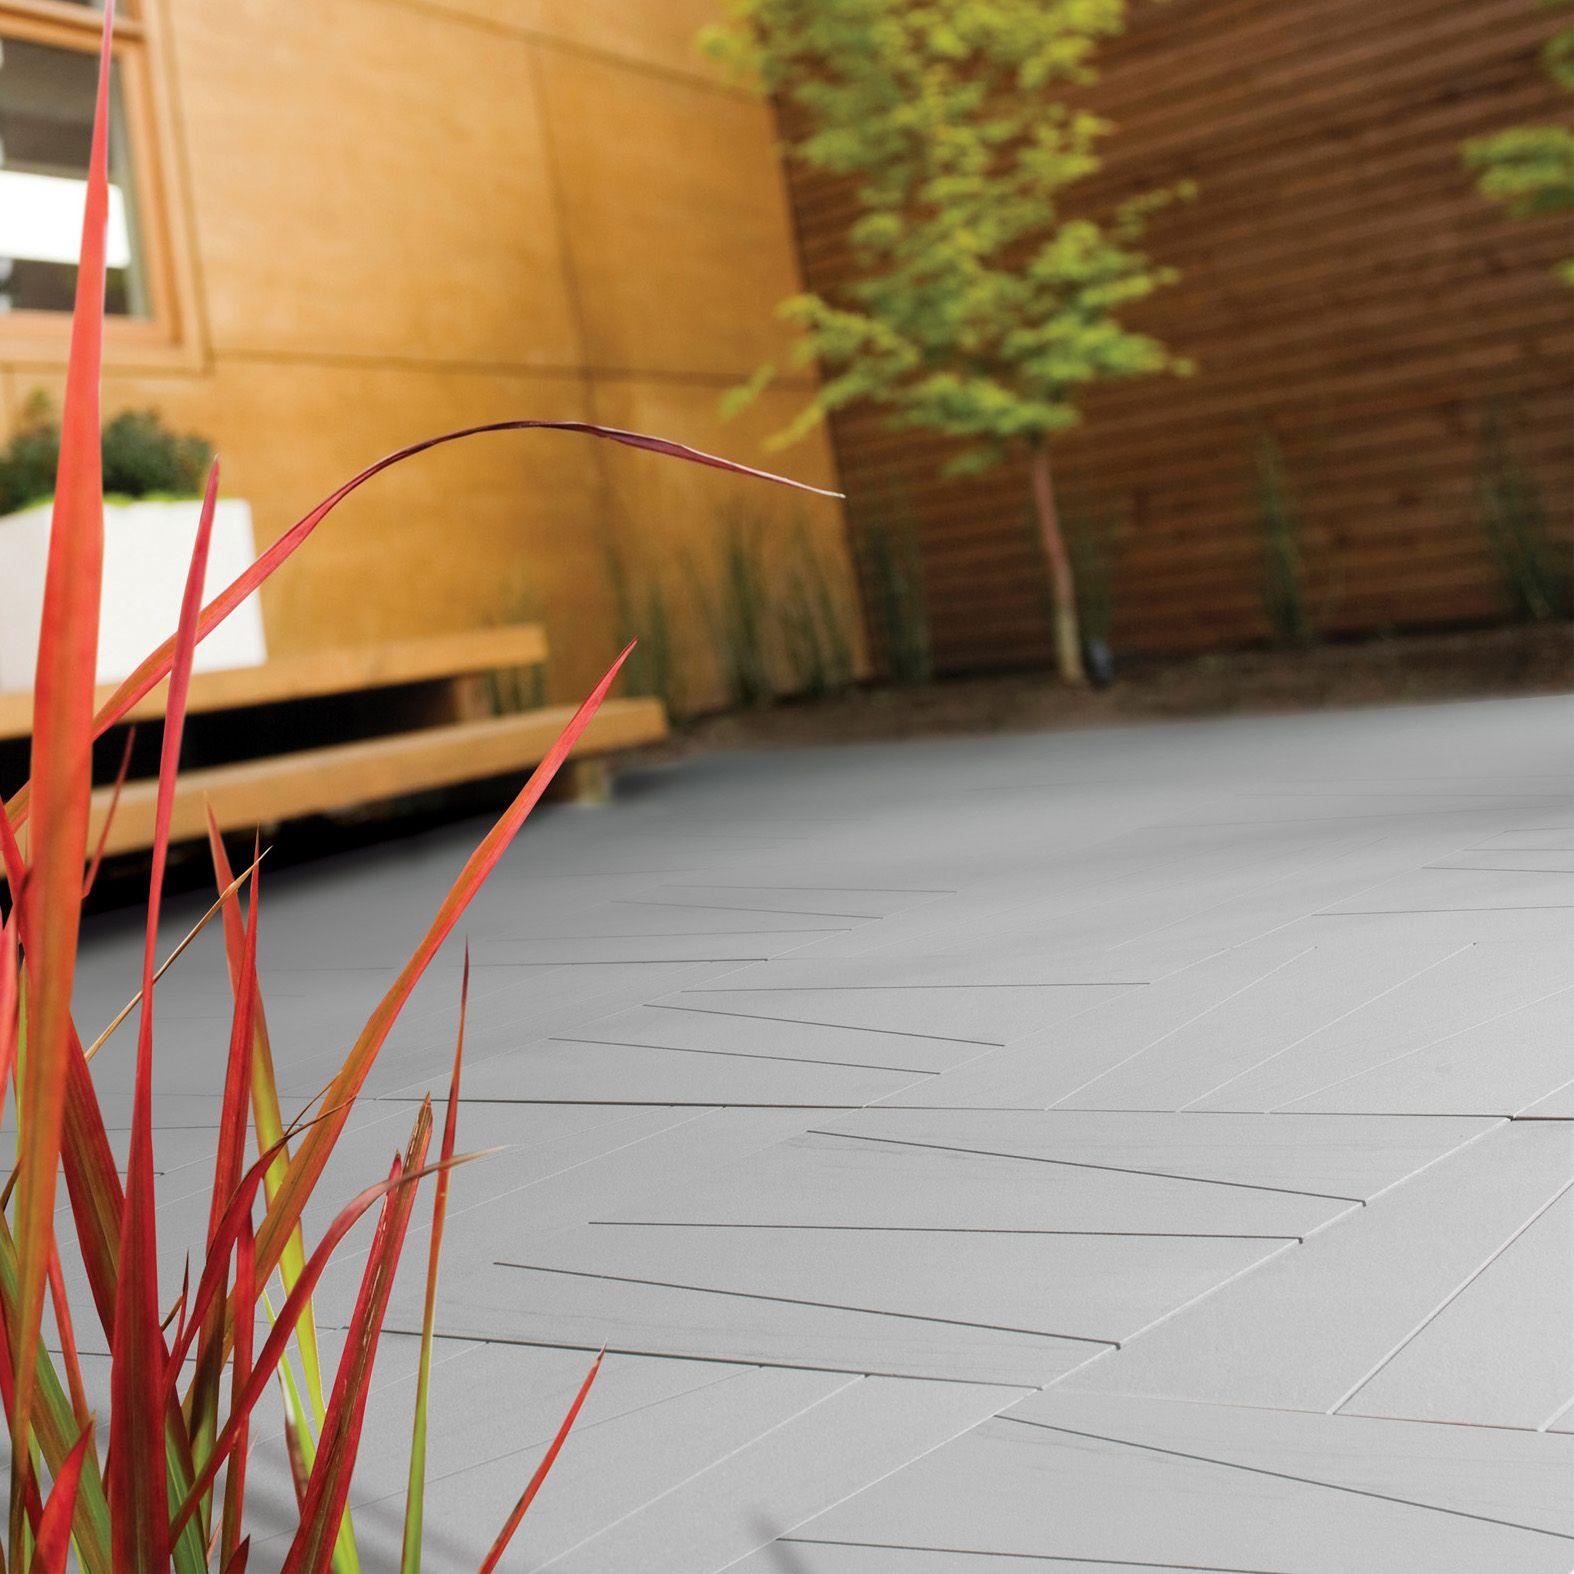 Ventura paving kit l 500mm w 500mm departments diy for Garden decking kits b q